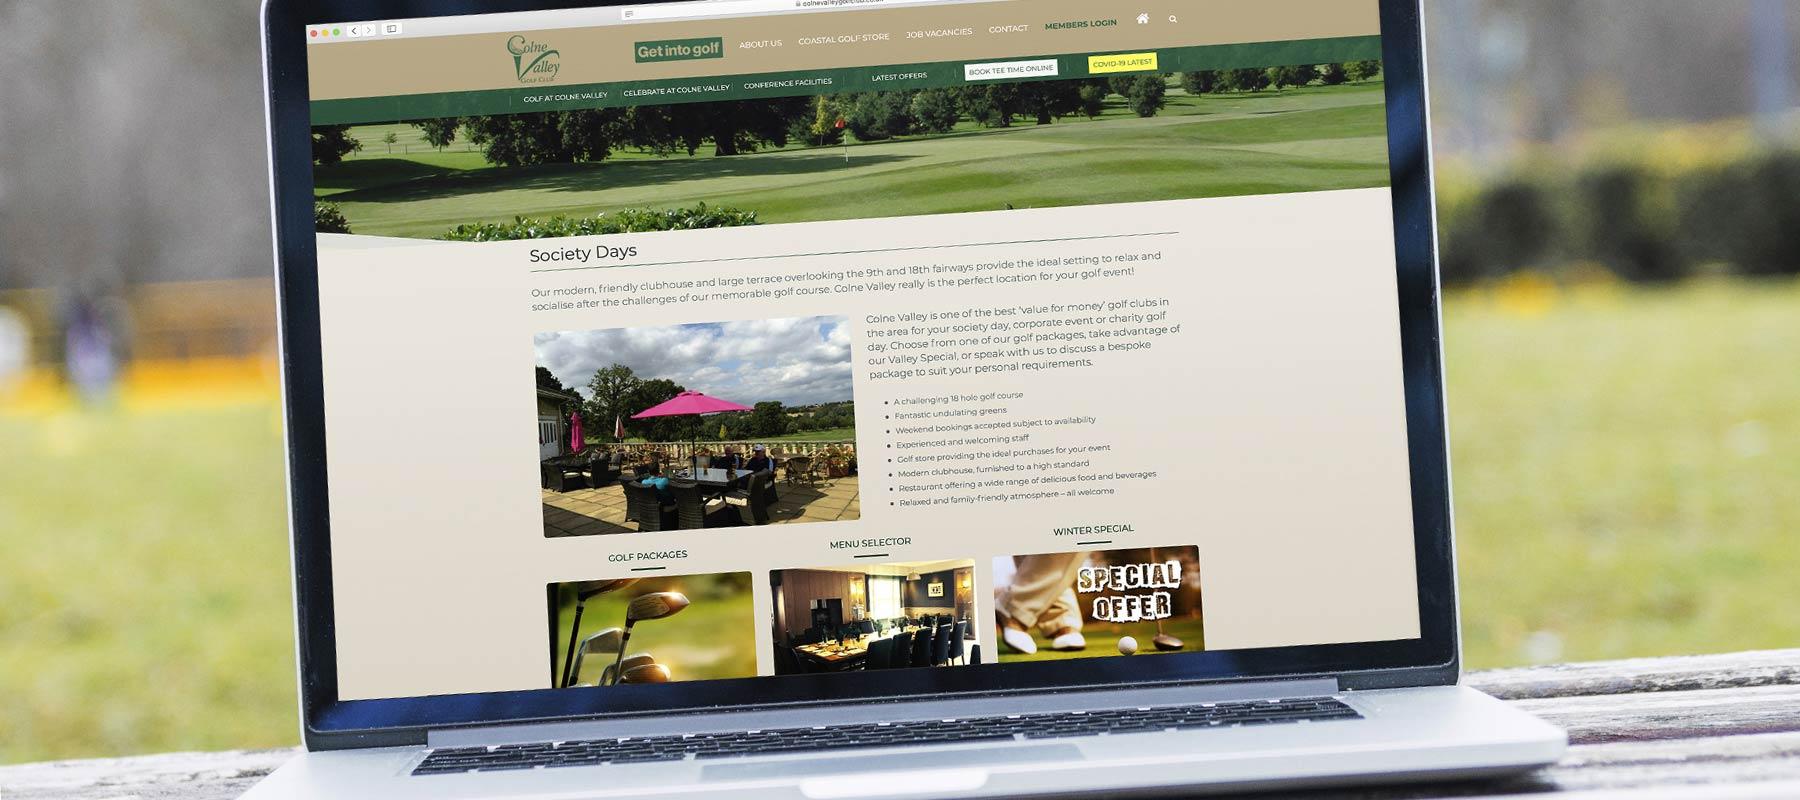 Colne Valley Golf Club - Website